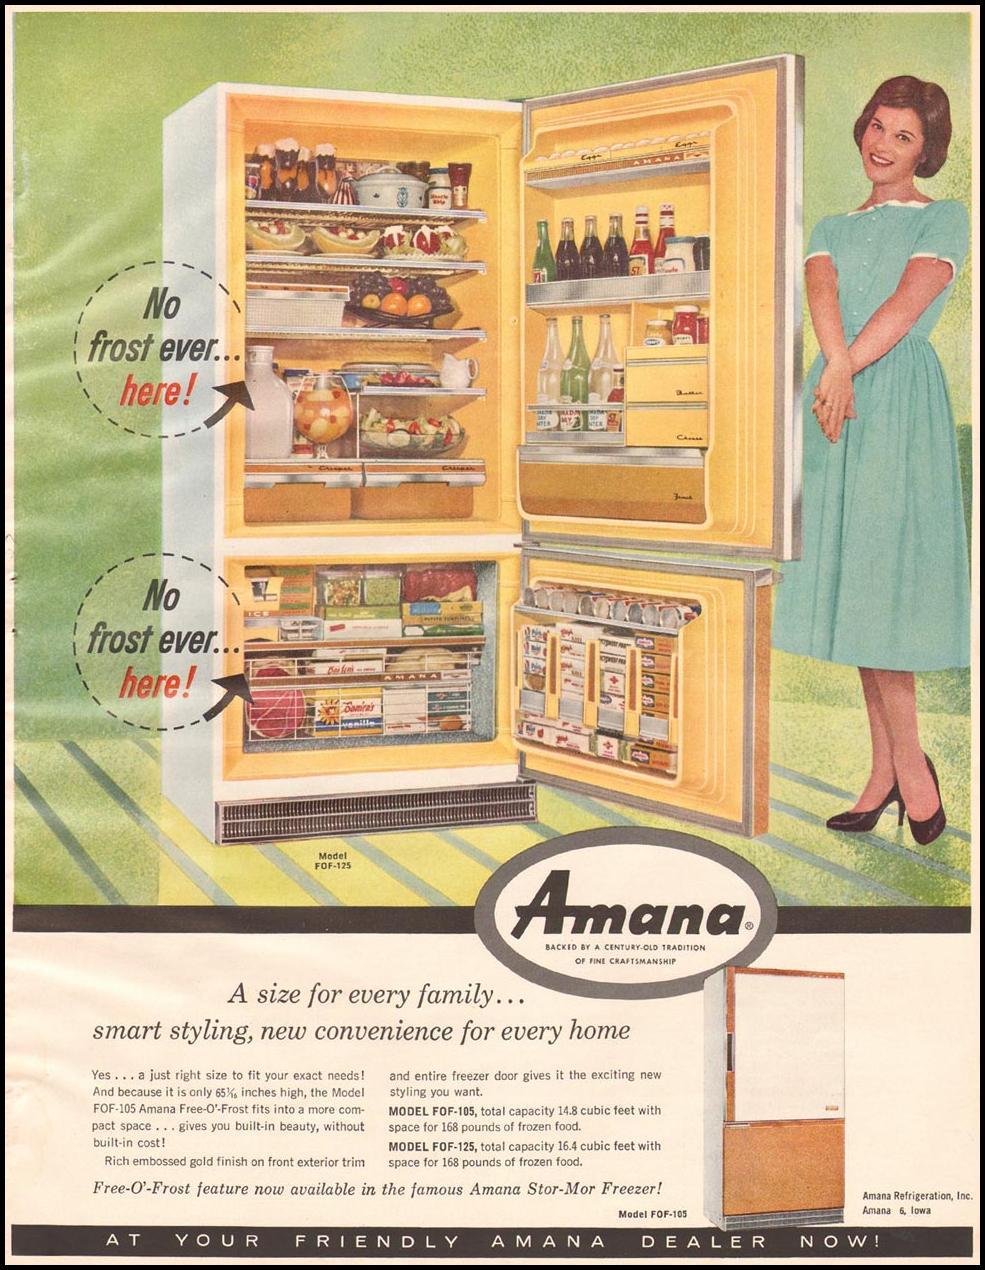 AMANA REFRIGERATORS BETTER HOMES AND GARDENS 03/01/1960 p. 137